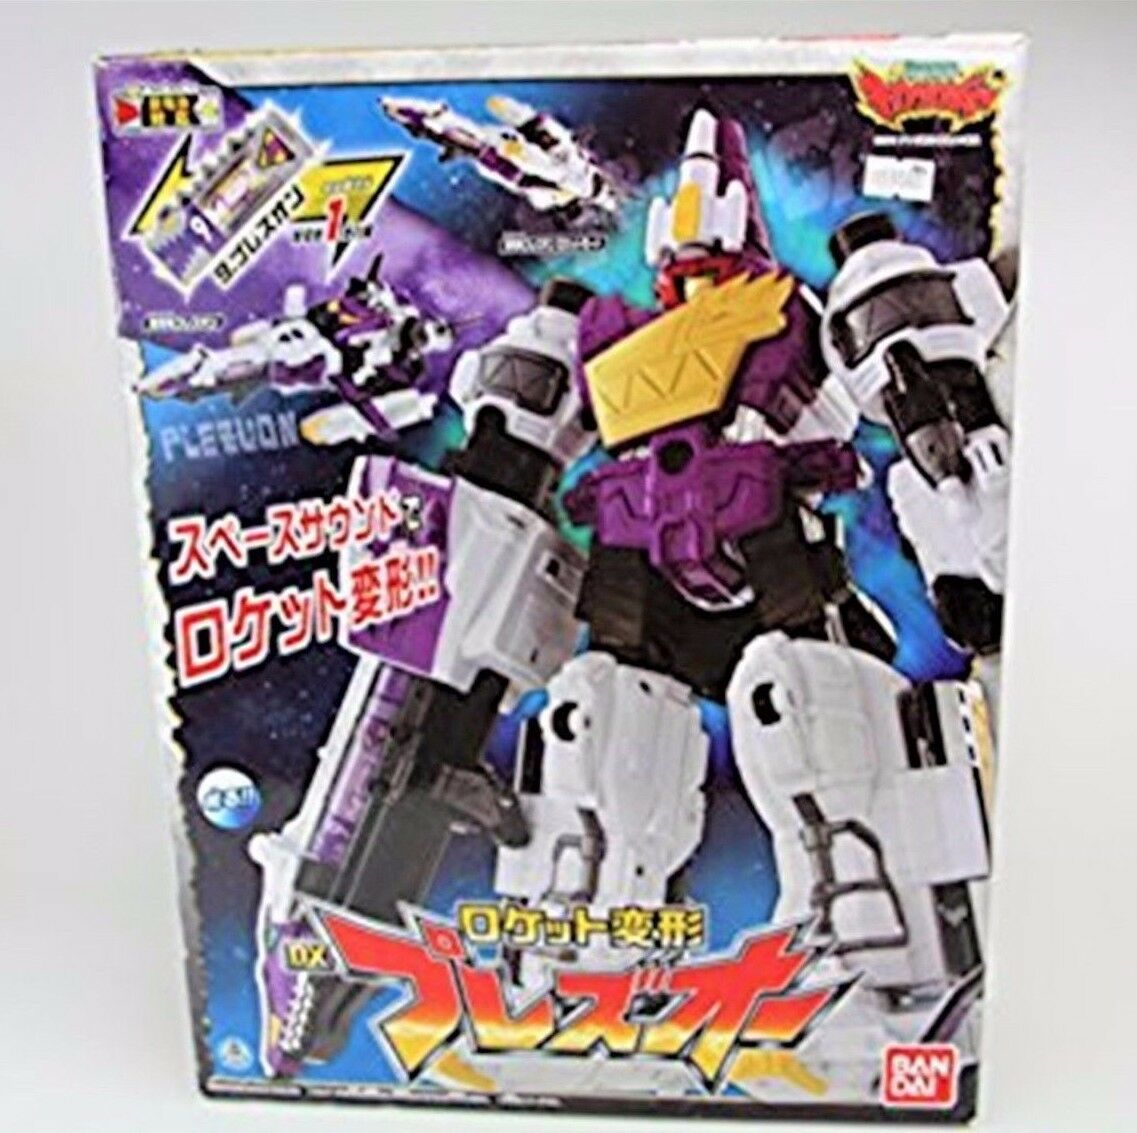 Power Rangers Dino Charge Kyoryuger Plesio Charge Megazord Plezuon Plezu-Oh USED